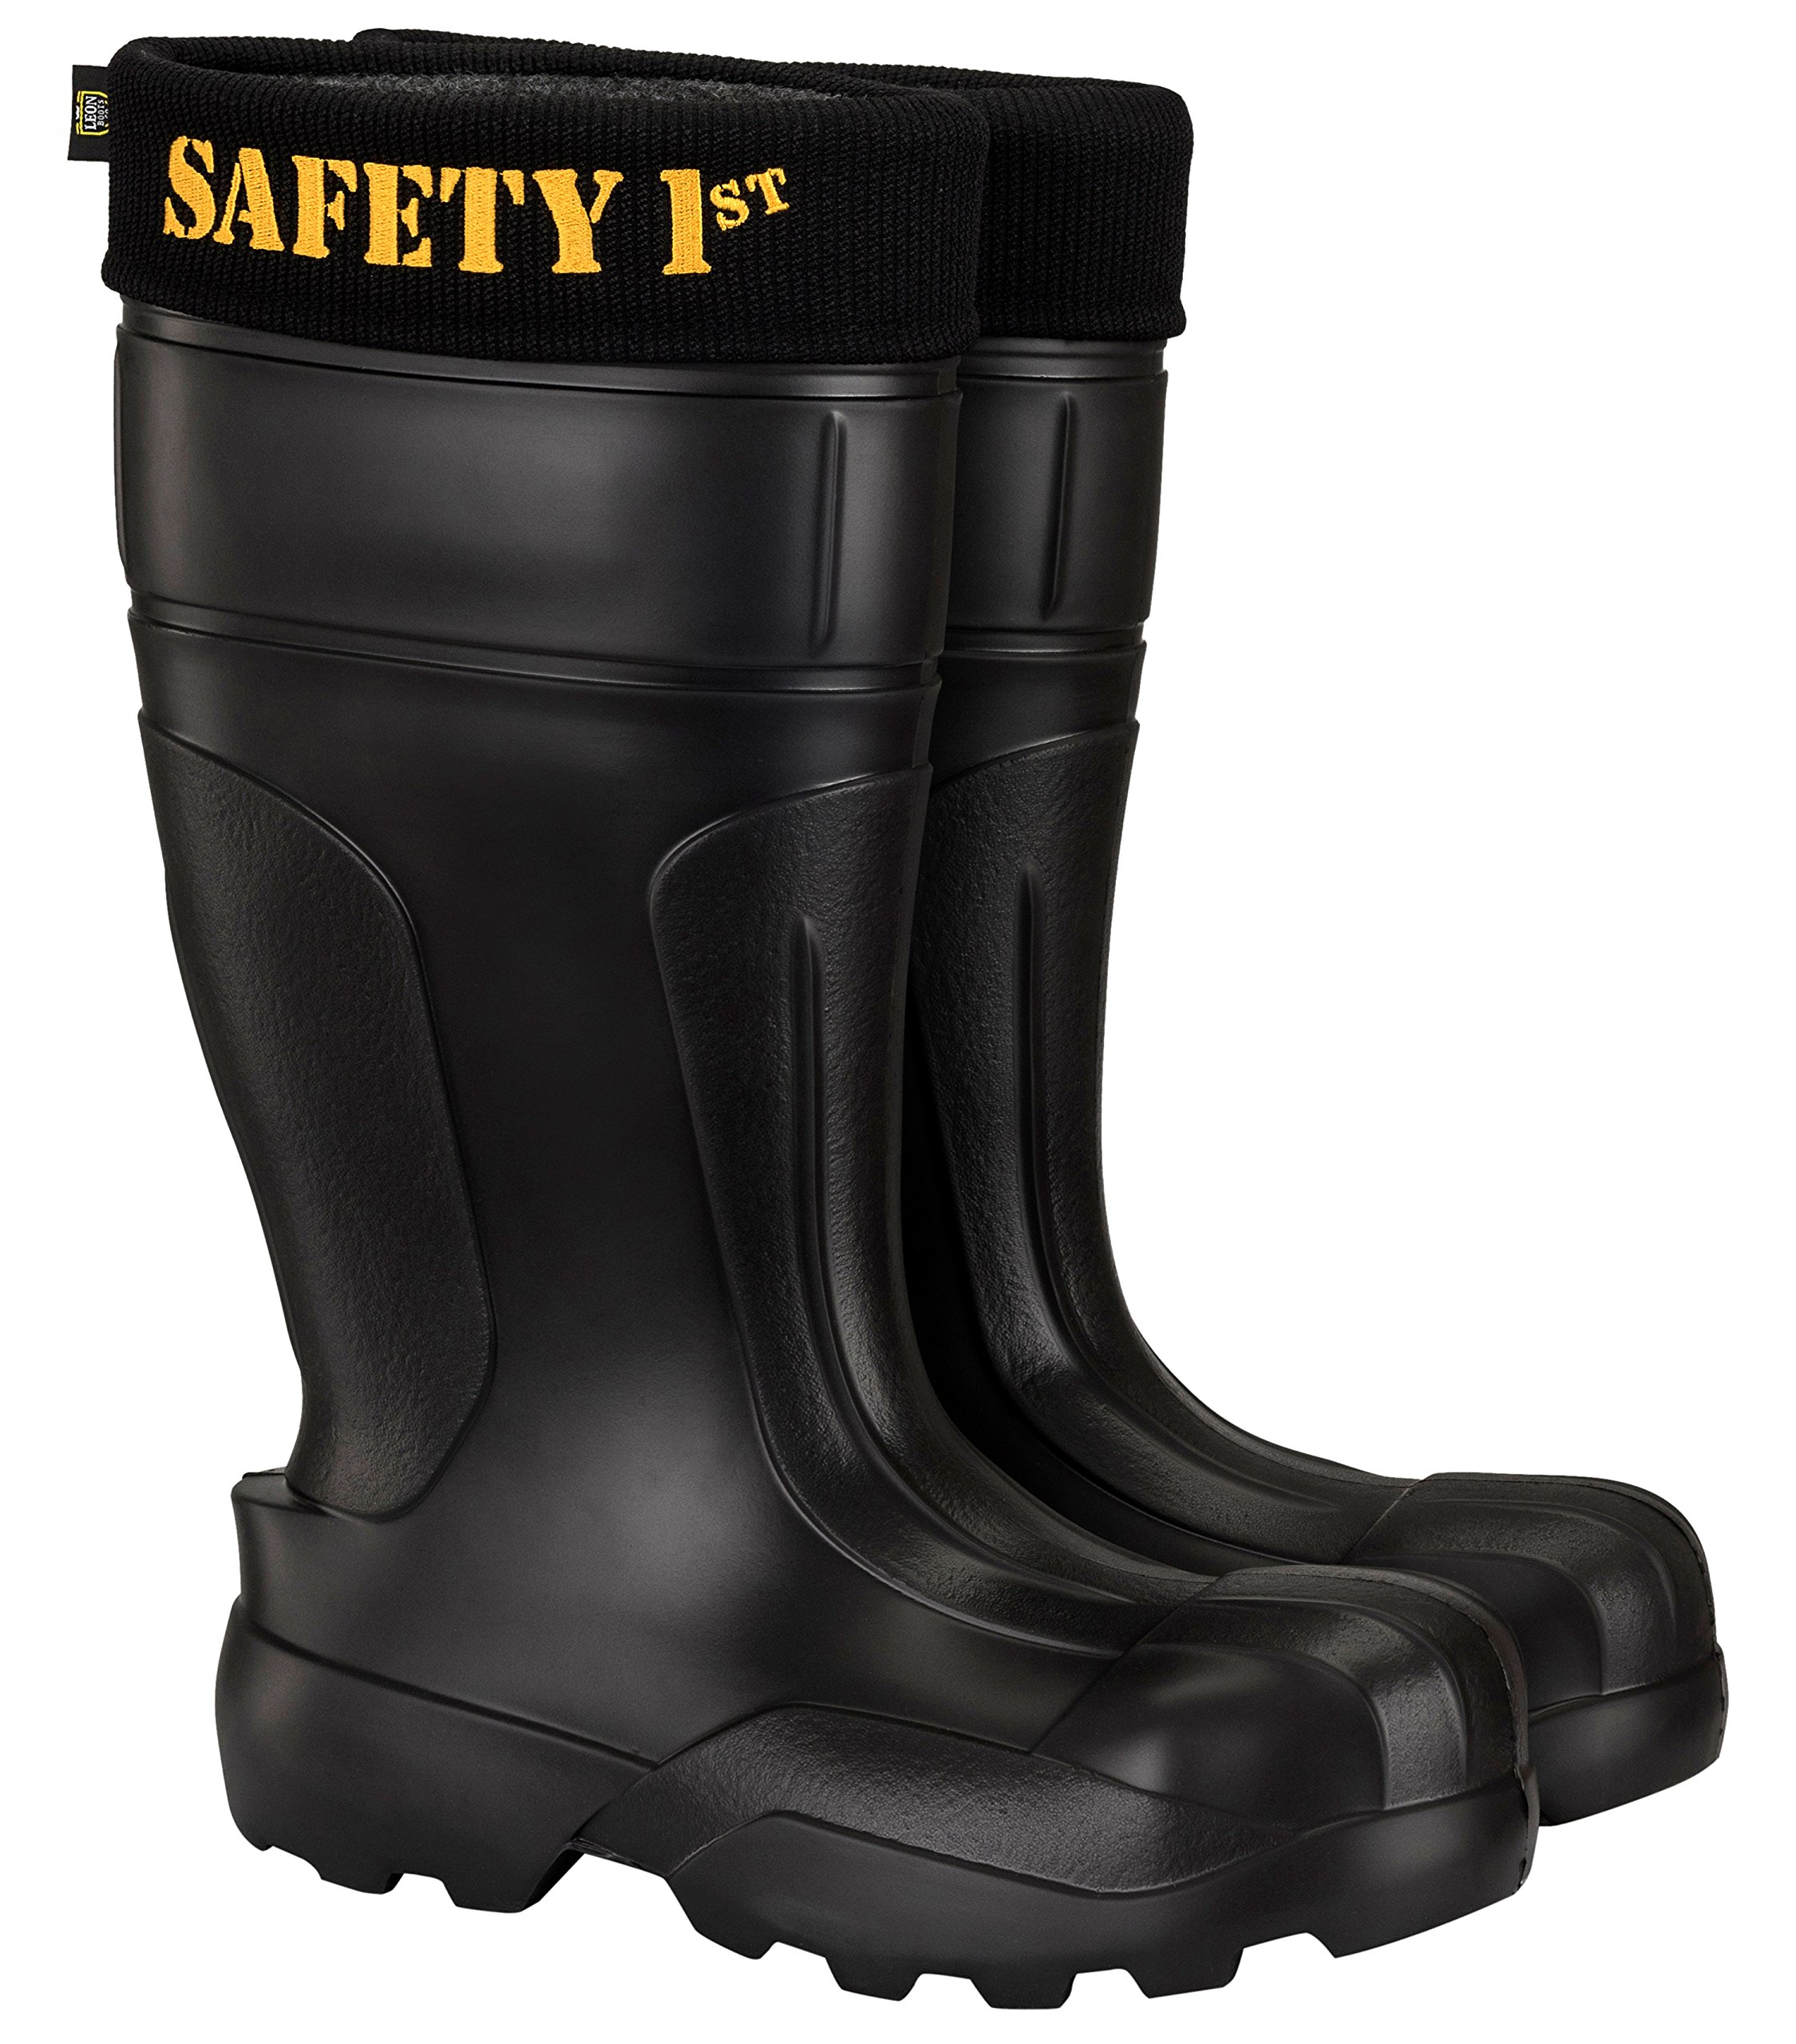 Leon Boots Co. Ultralight Men's Safety 1st EVA Non-Slip Boots, Size US 10-10-1/2, EU 44, Black